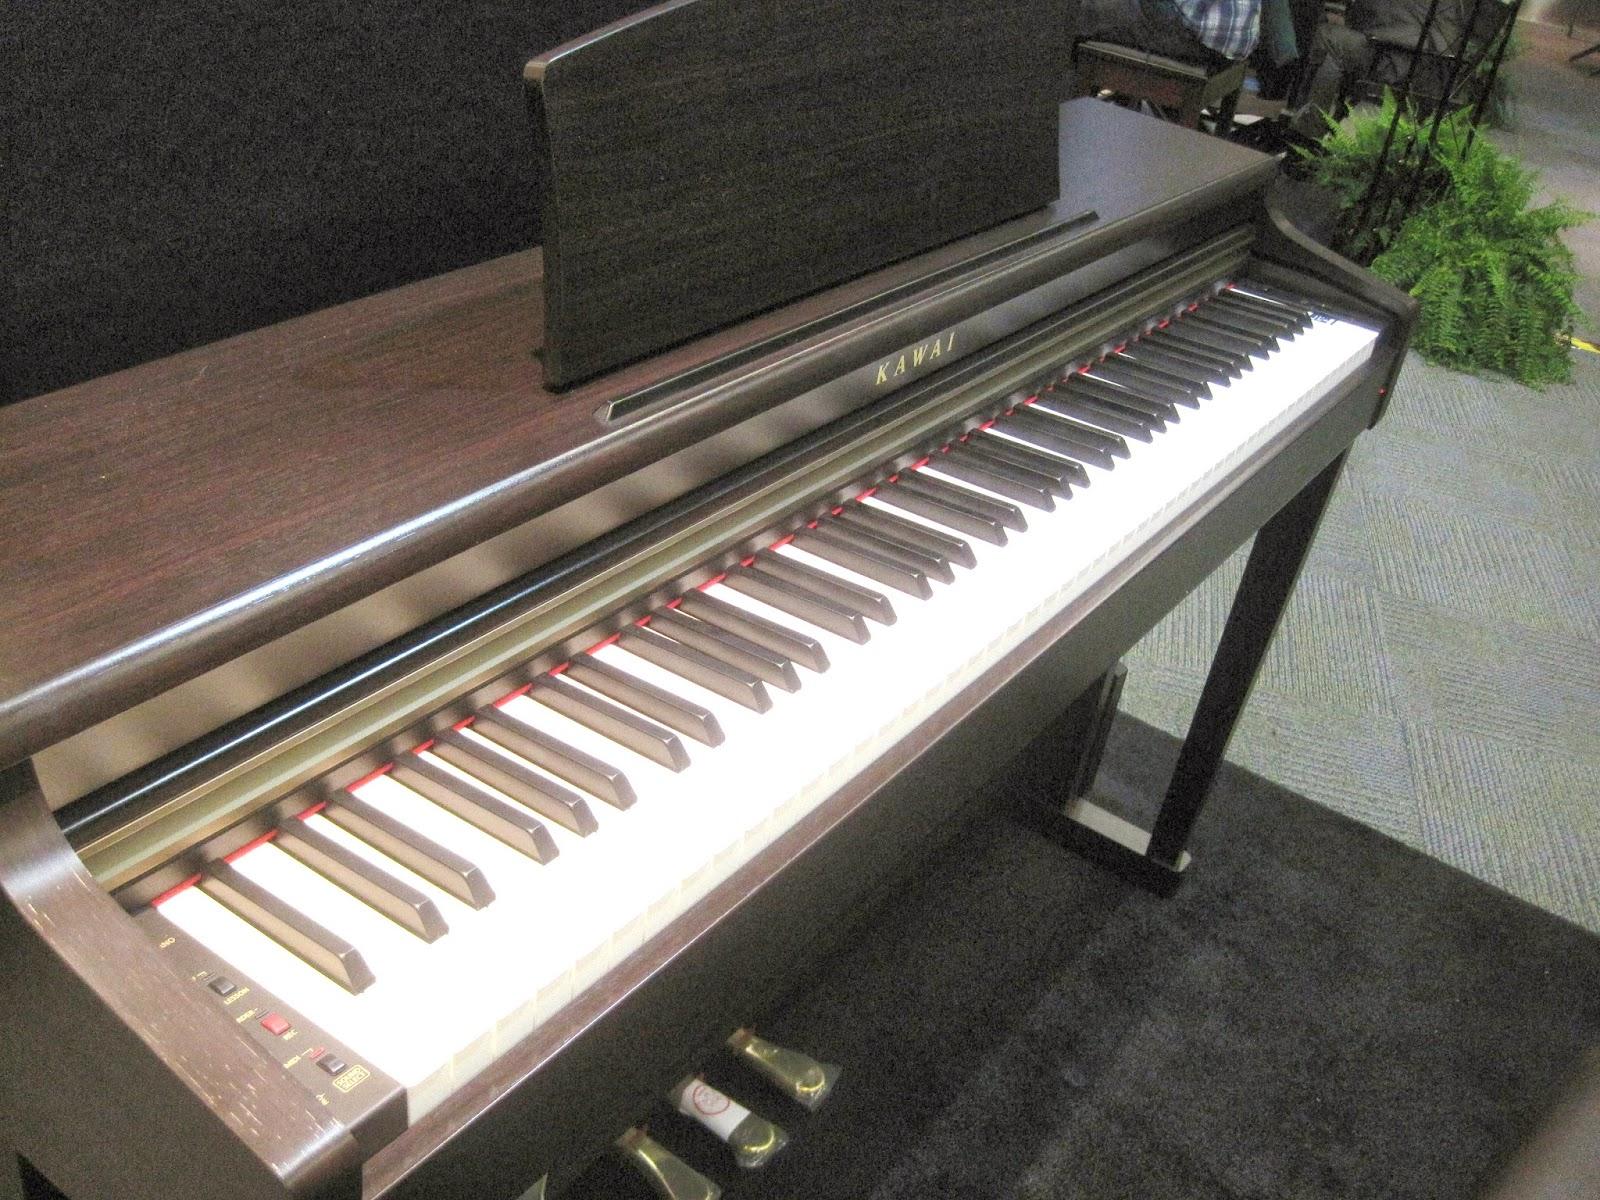 az piano reviews review kawai cn24 digital piano very nice for the price digital piano. Black Bedroom Furniture Sets. Home Design Ideas